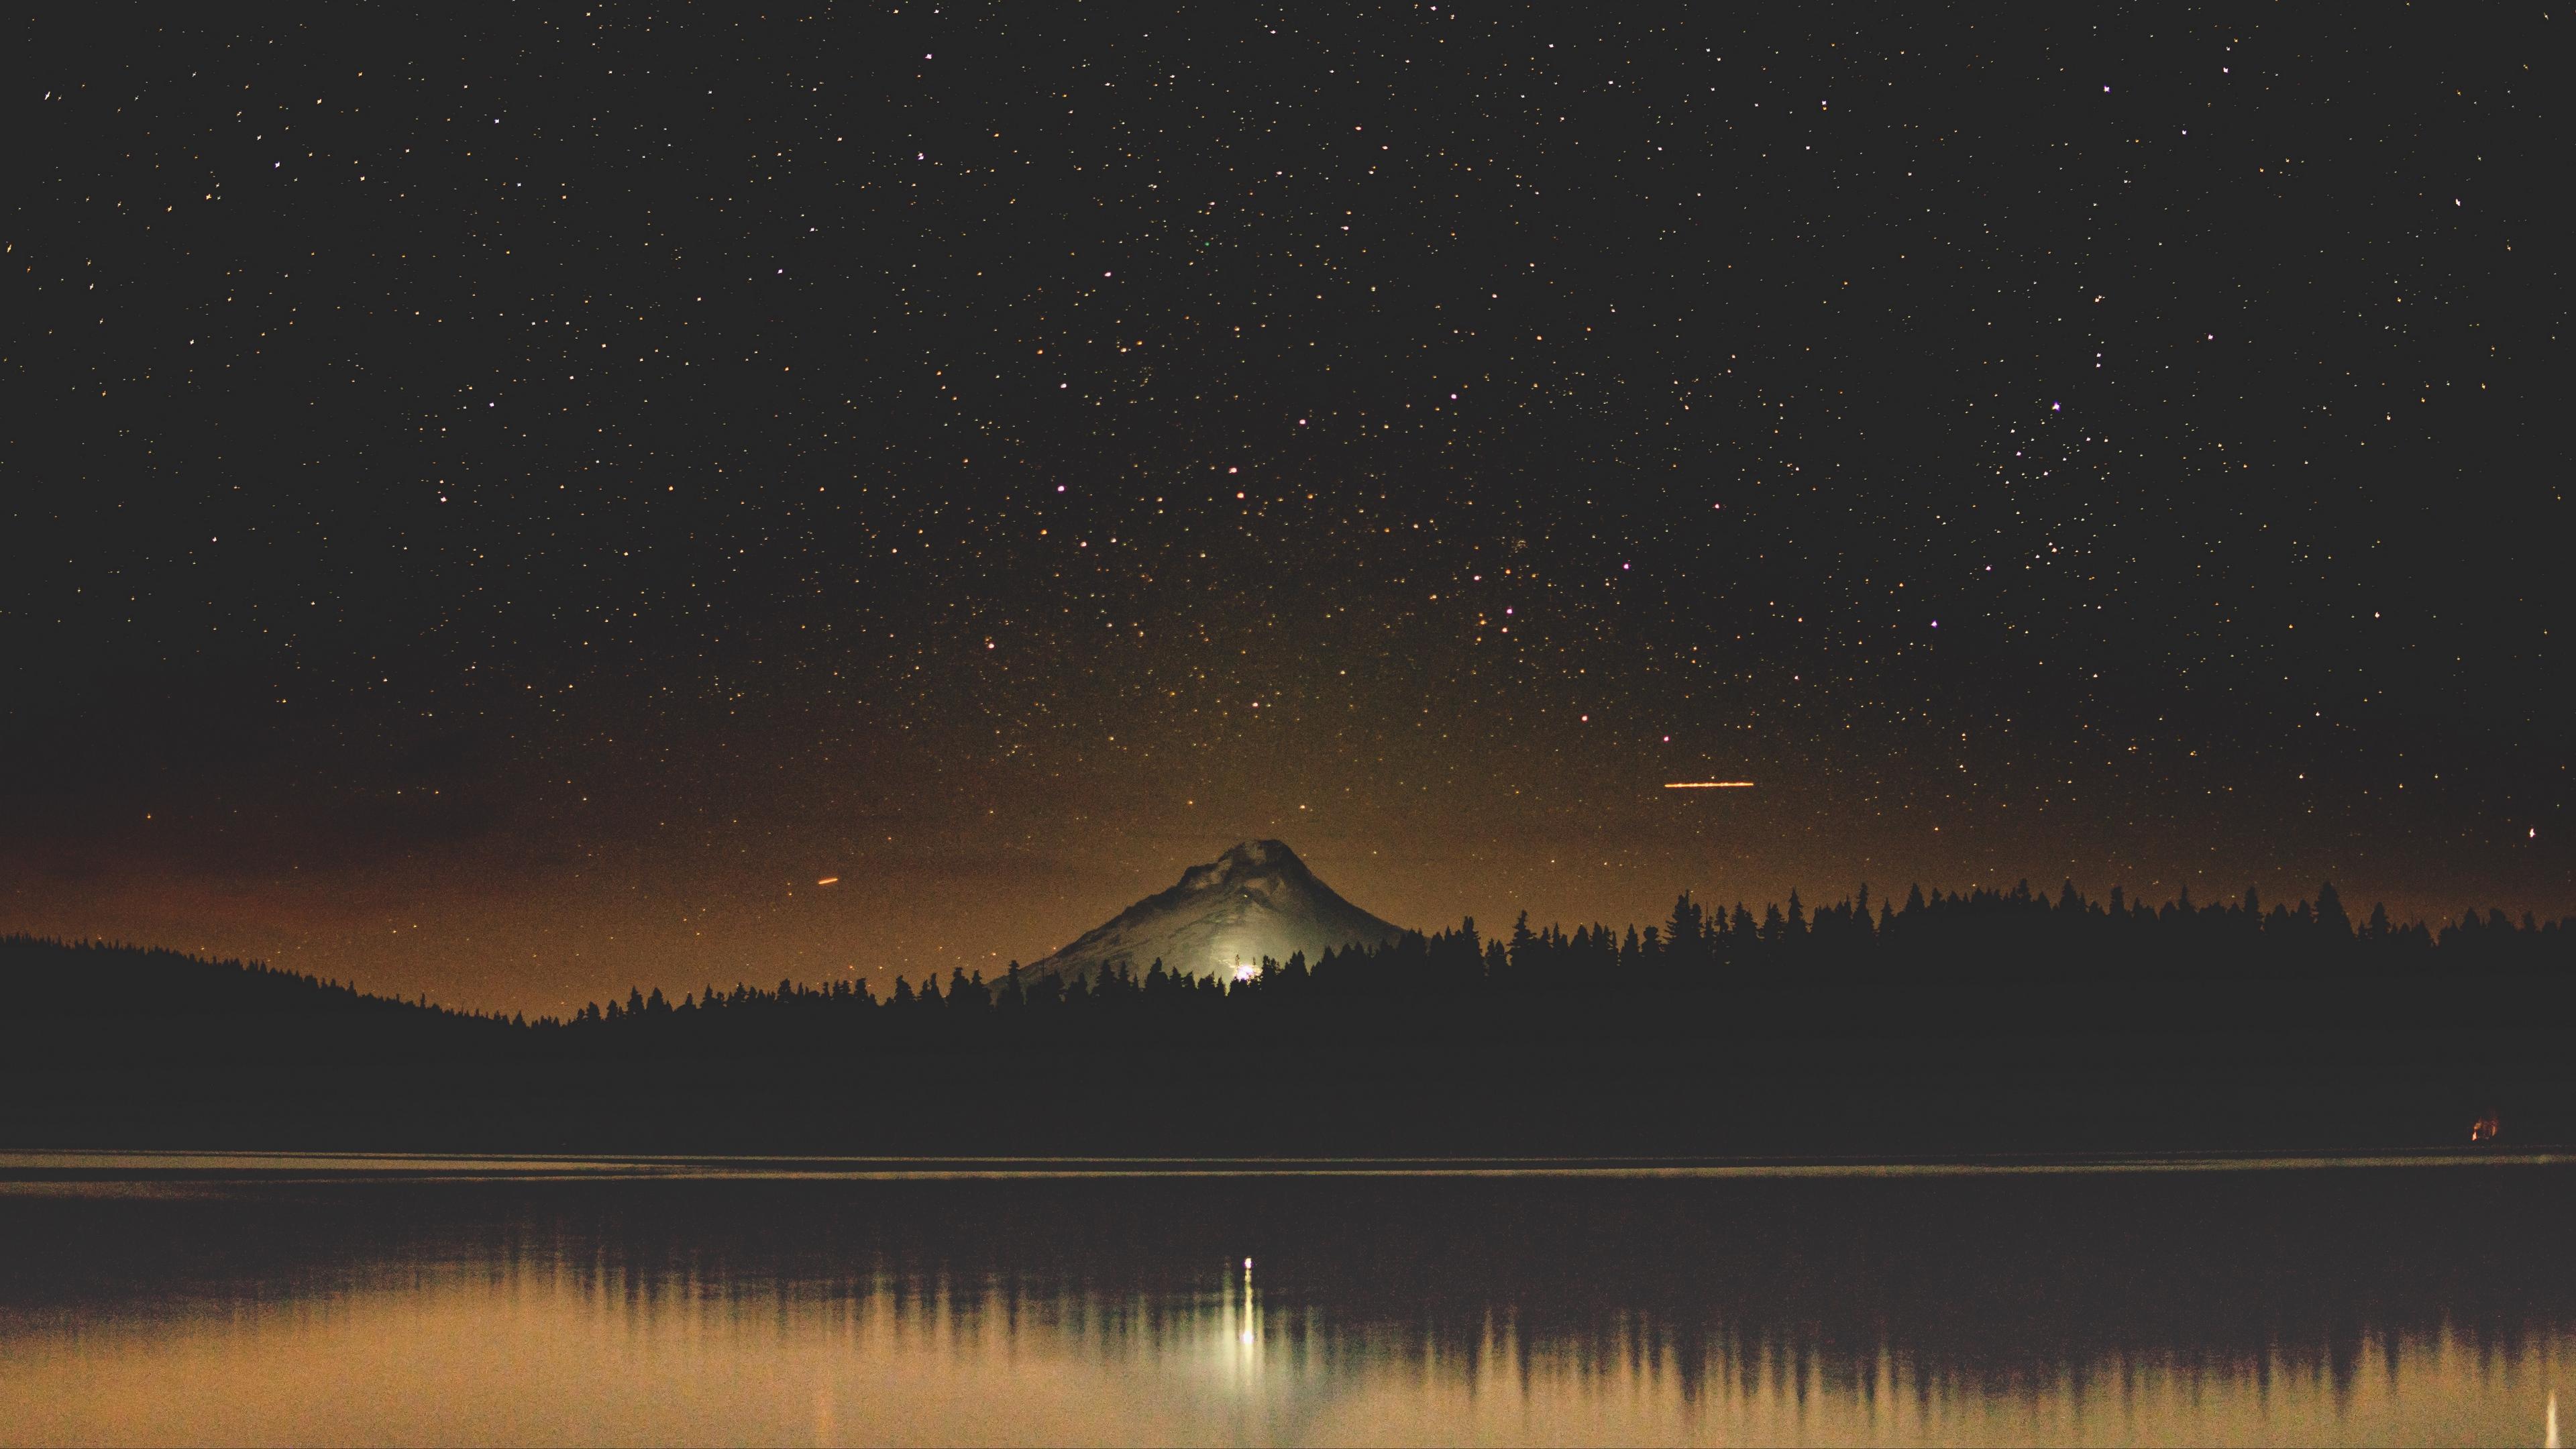 starry sky lake mountain trees night timothy lake united states 4k 1541117448 - starry sky, lake, mountain, trees, night, timothy lake, united states 4k - starry sky, Mountain, Lake